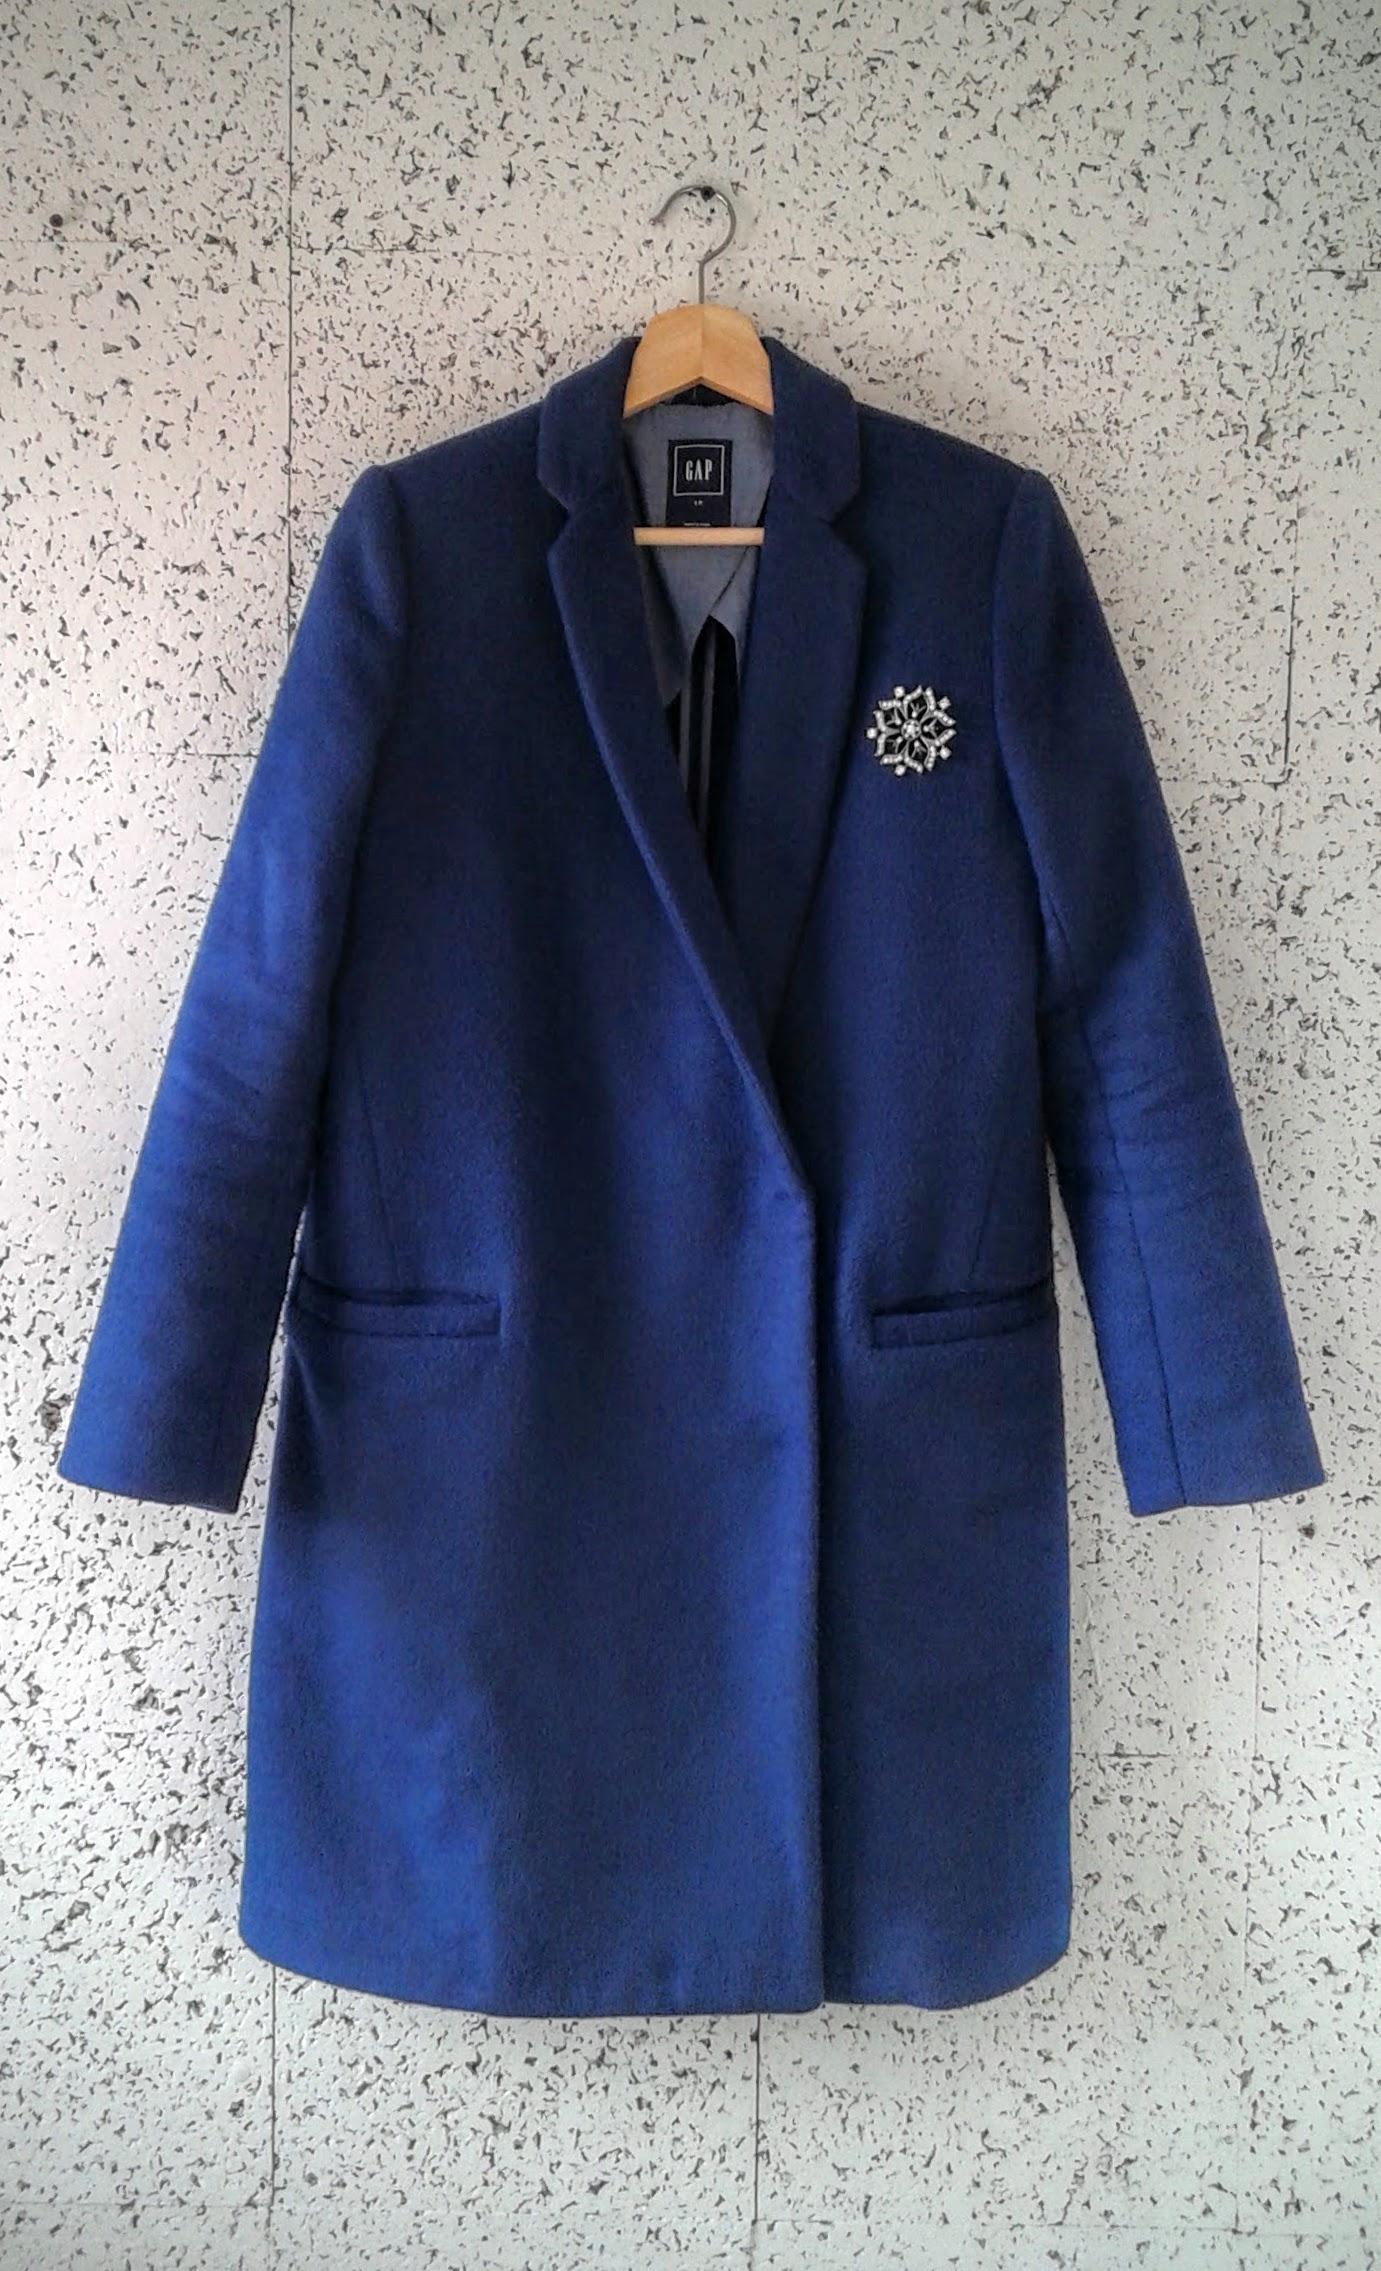 Gap coat; Size S, $48. Pin, $14